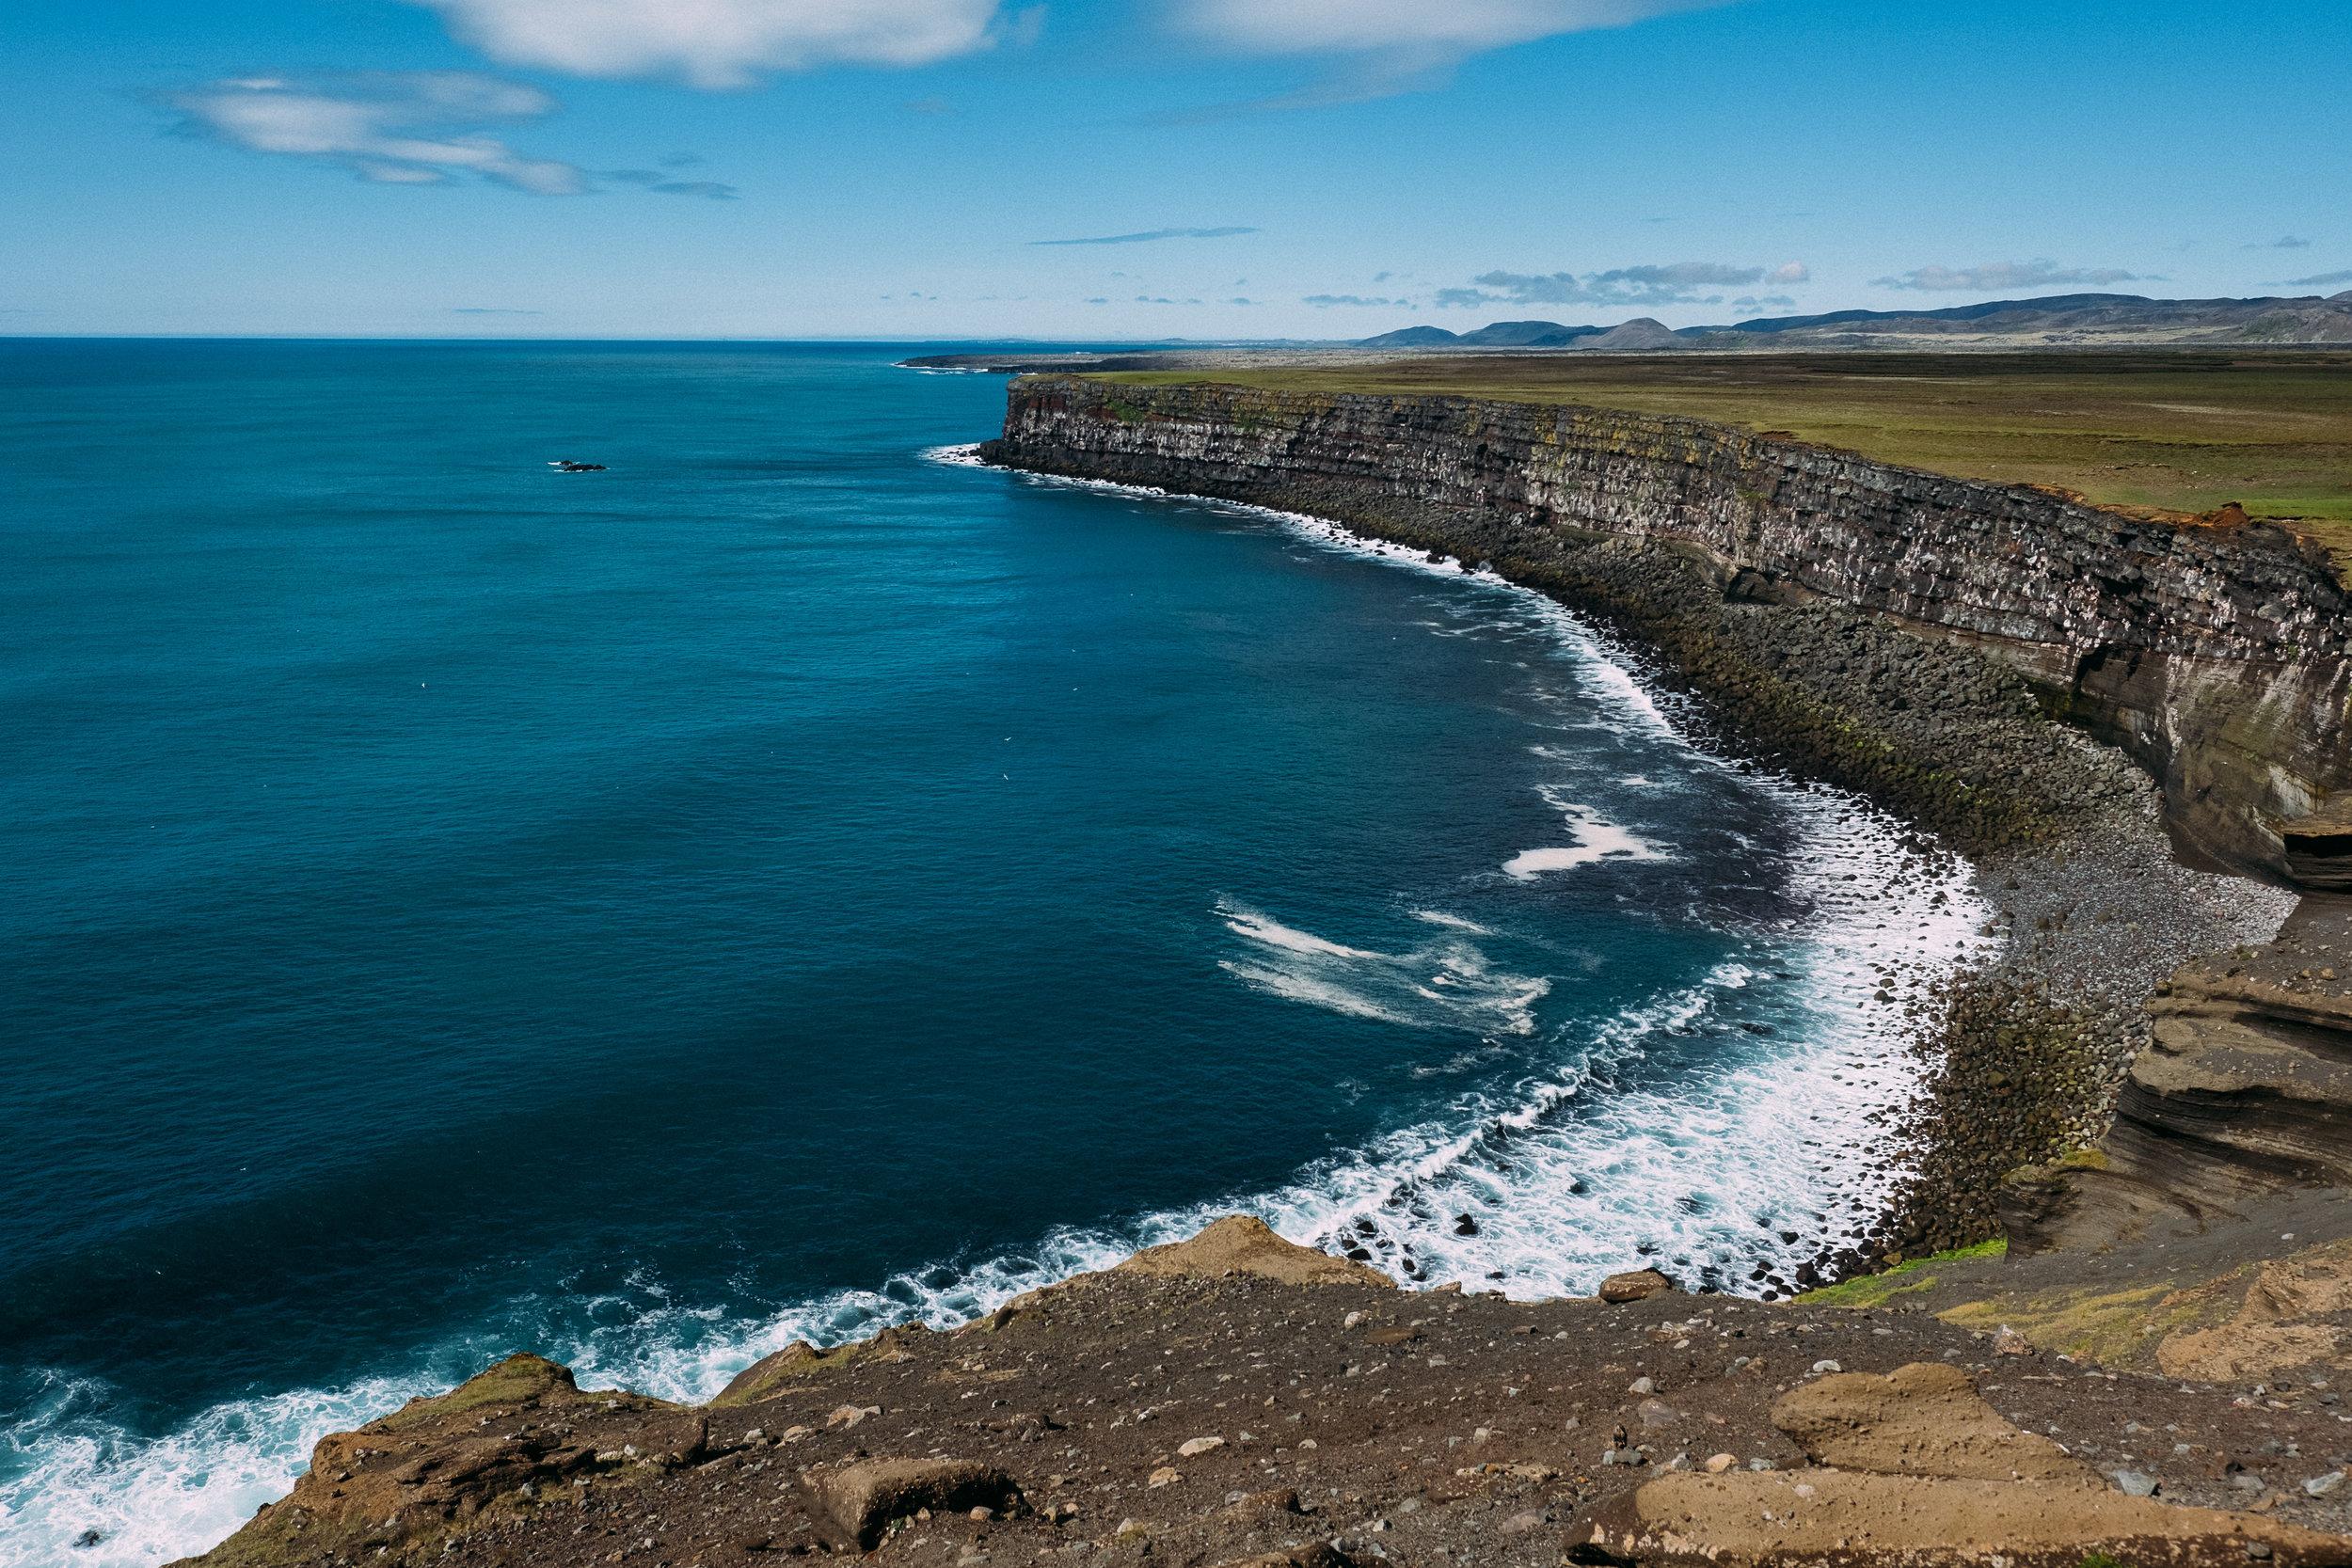 Krisuvikurberg Cliffs -  [63.8284791,-22.1115541]  Fuji X-H1 + 16mm 1.4 lens